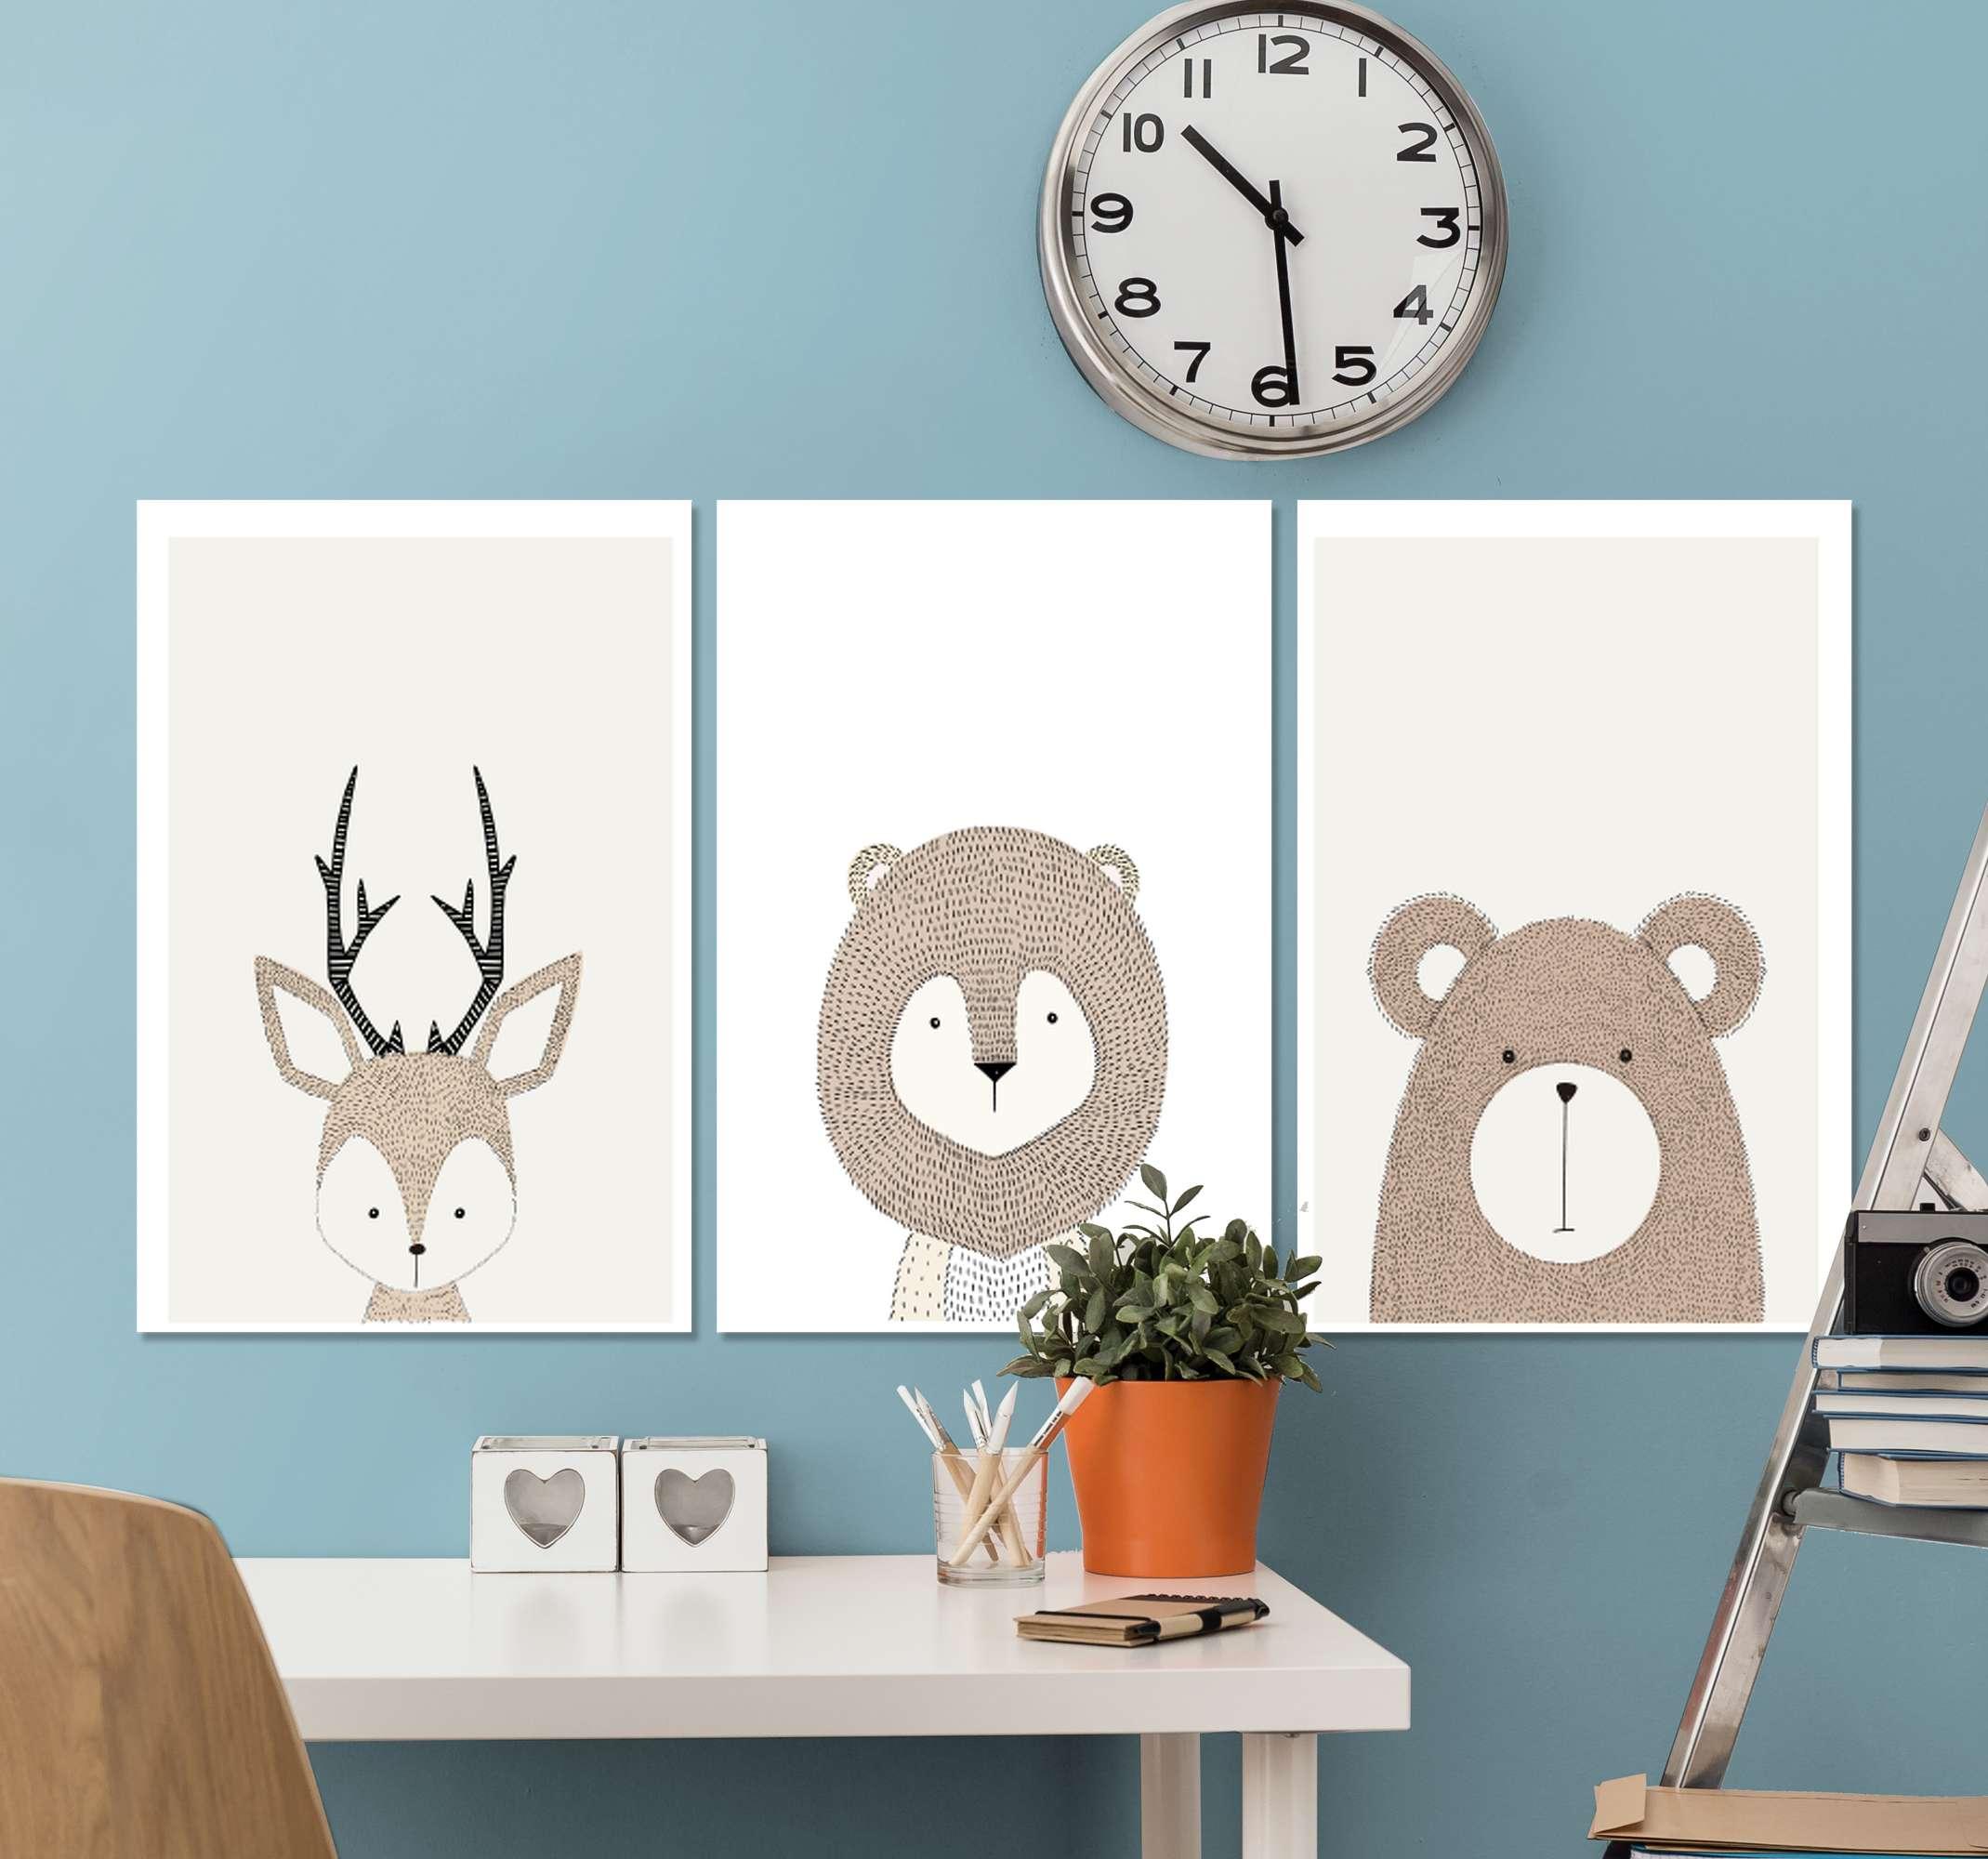 TenStickers. 三联画动物卧室卧室帆布艺术. 与不同的卡通动物插画设计的三种画布艺术。它以高品质的饰面印刷,超级耐用且易于悬挂。